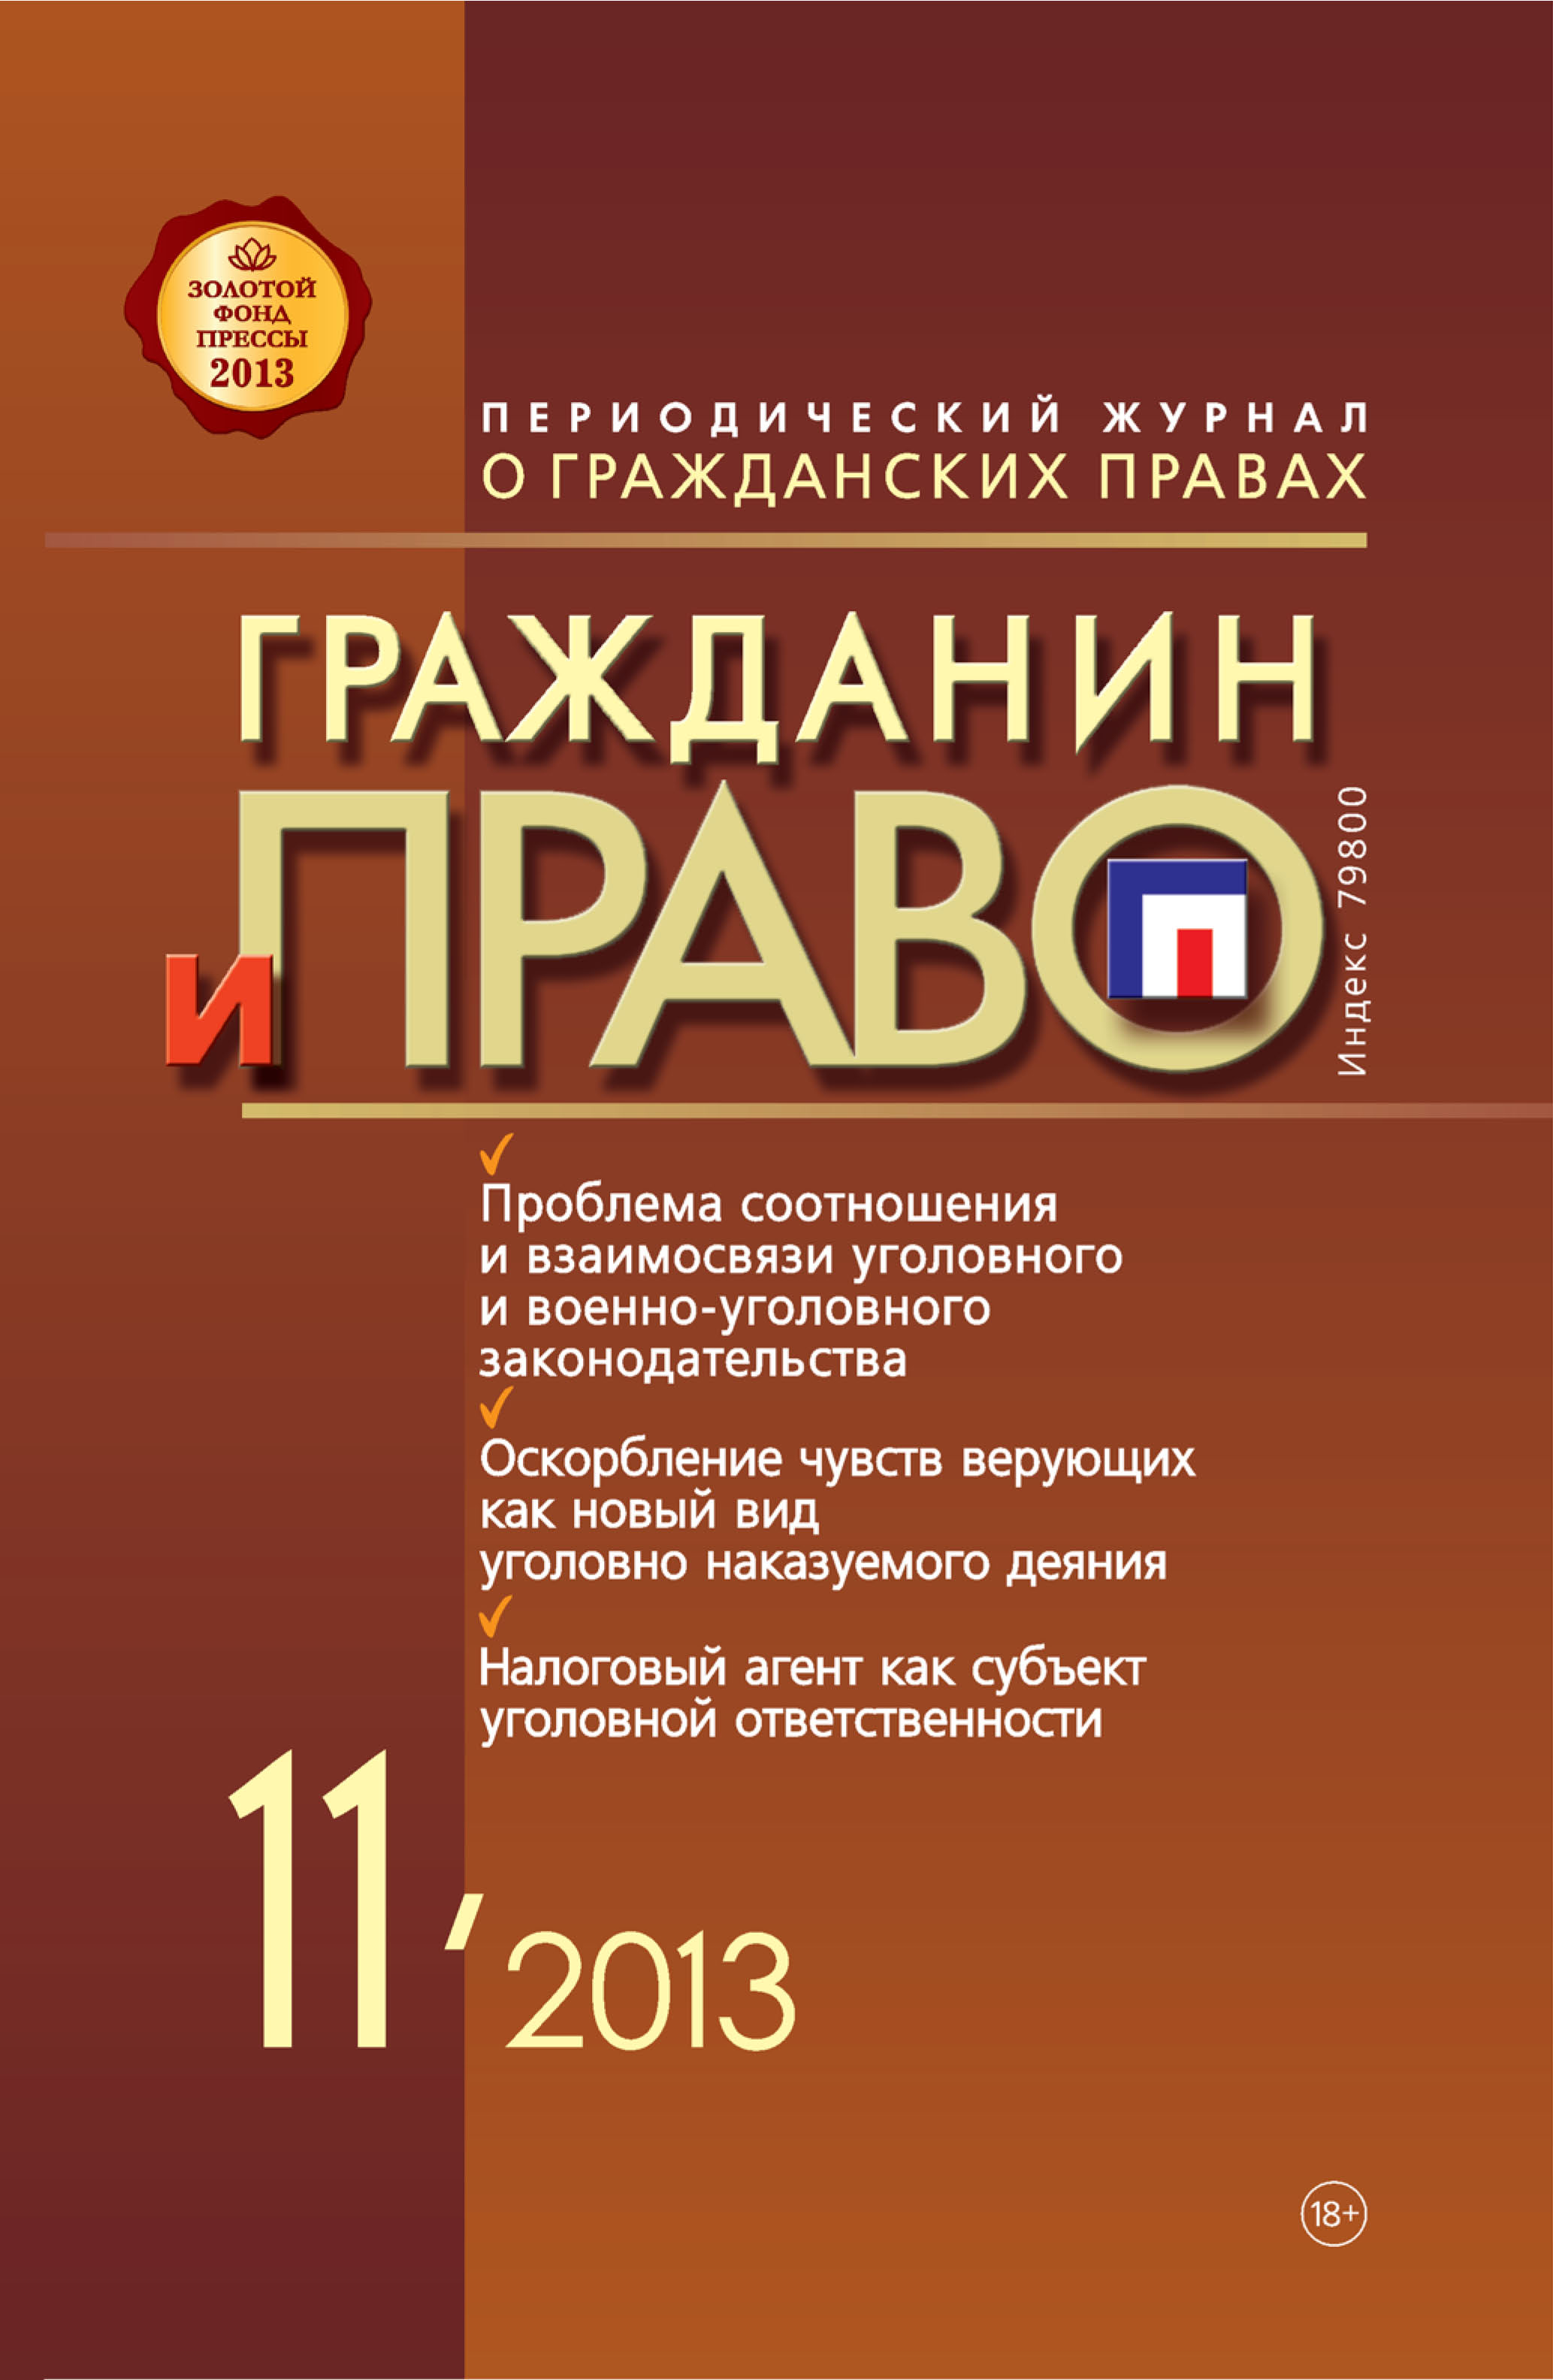 Гражданин и право №11/2013